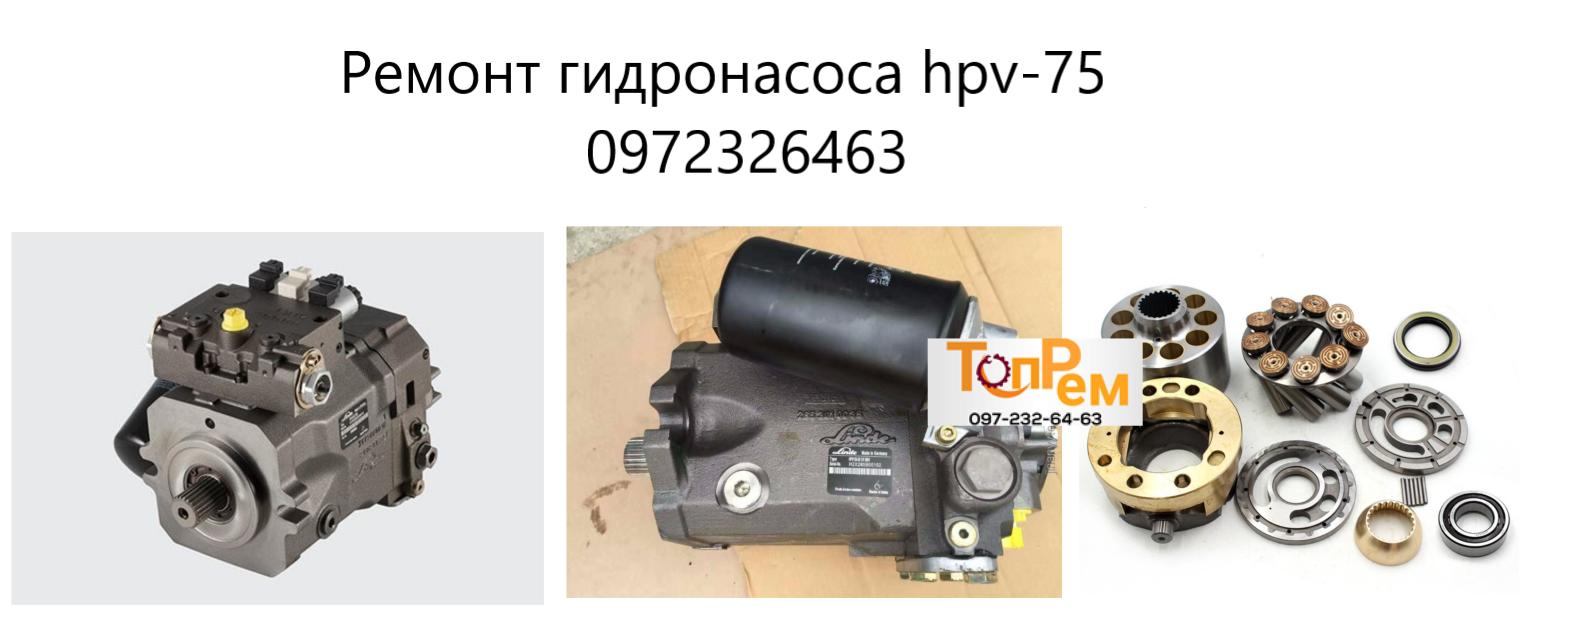 Ремонт гидронасоса Linde hpv-75